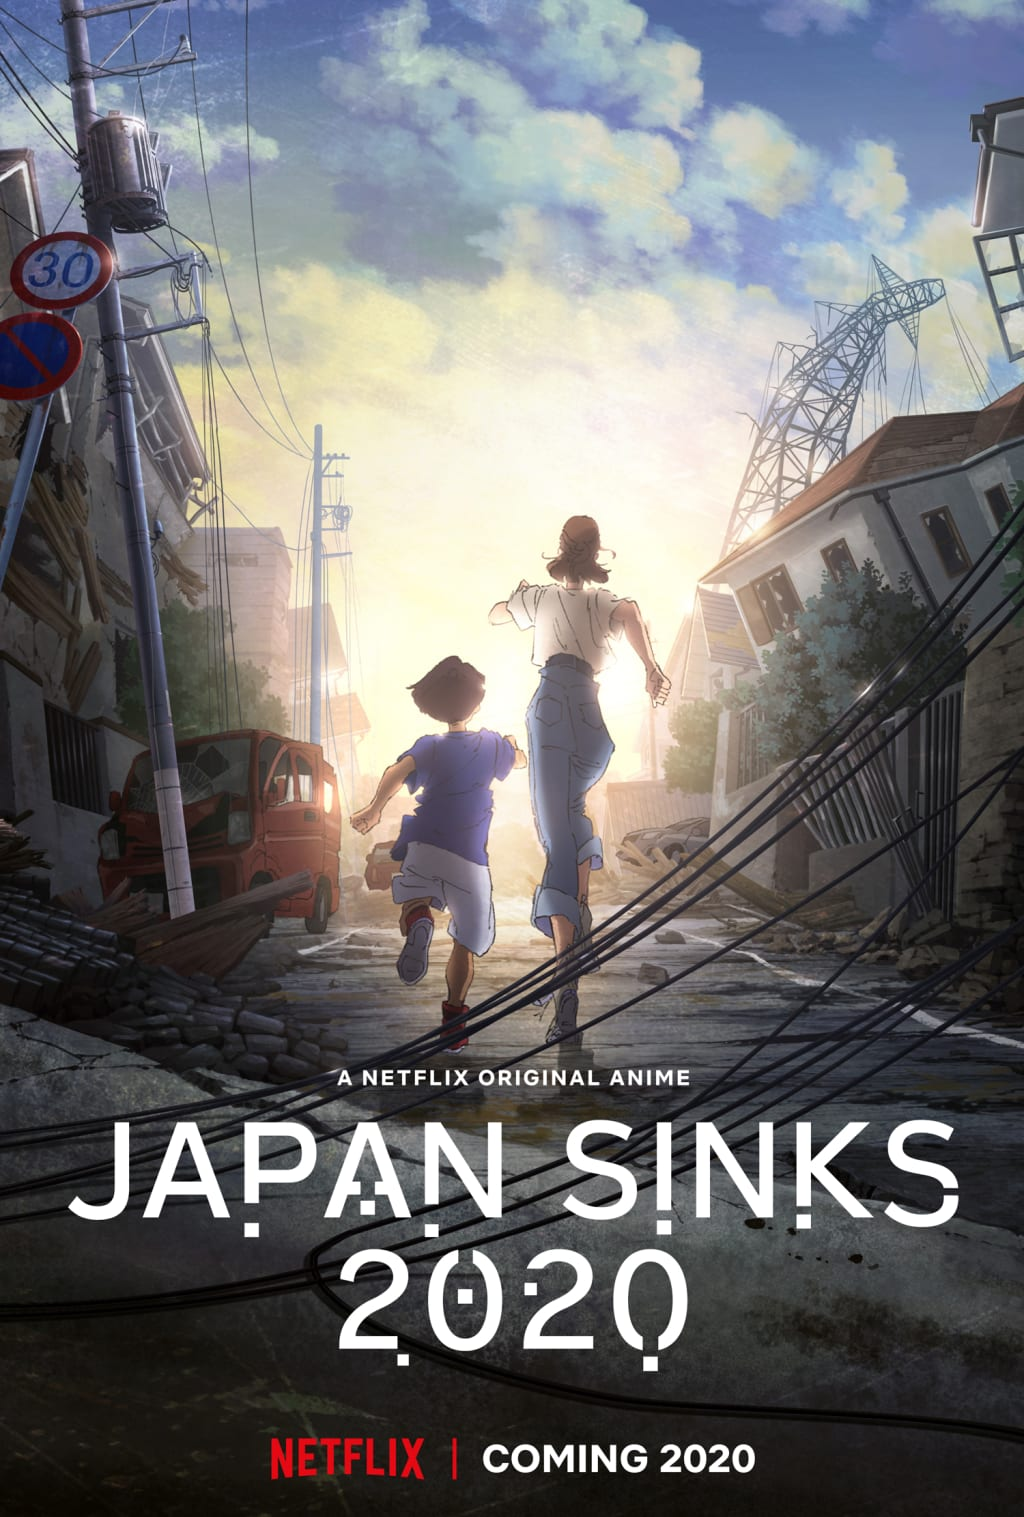 Japan Sinks 2020 Review